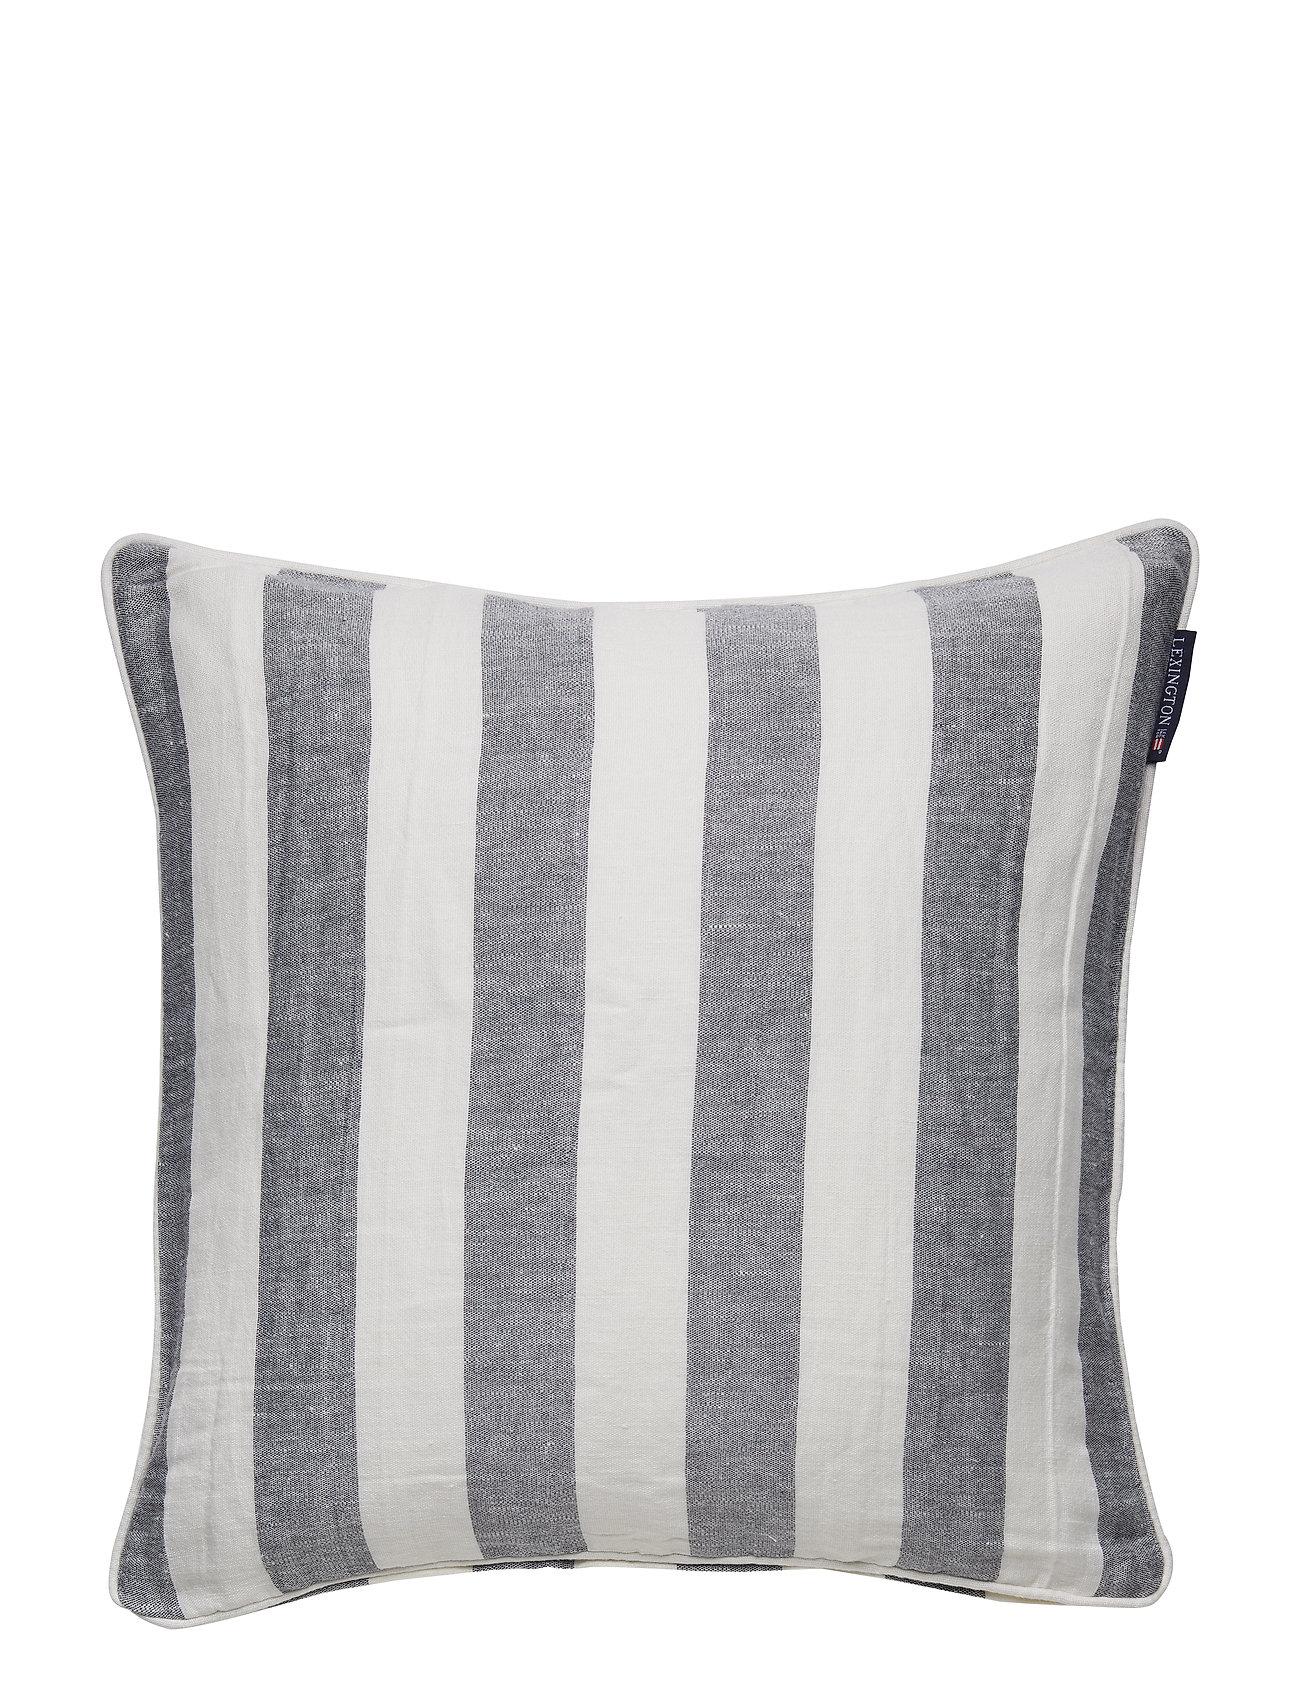 Lexington Home Viscose/Linen Striped Sham - BLUE/WHITE